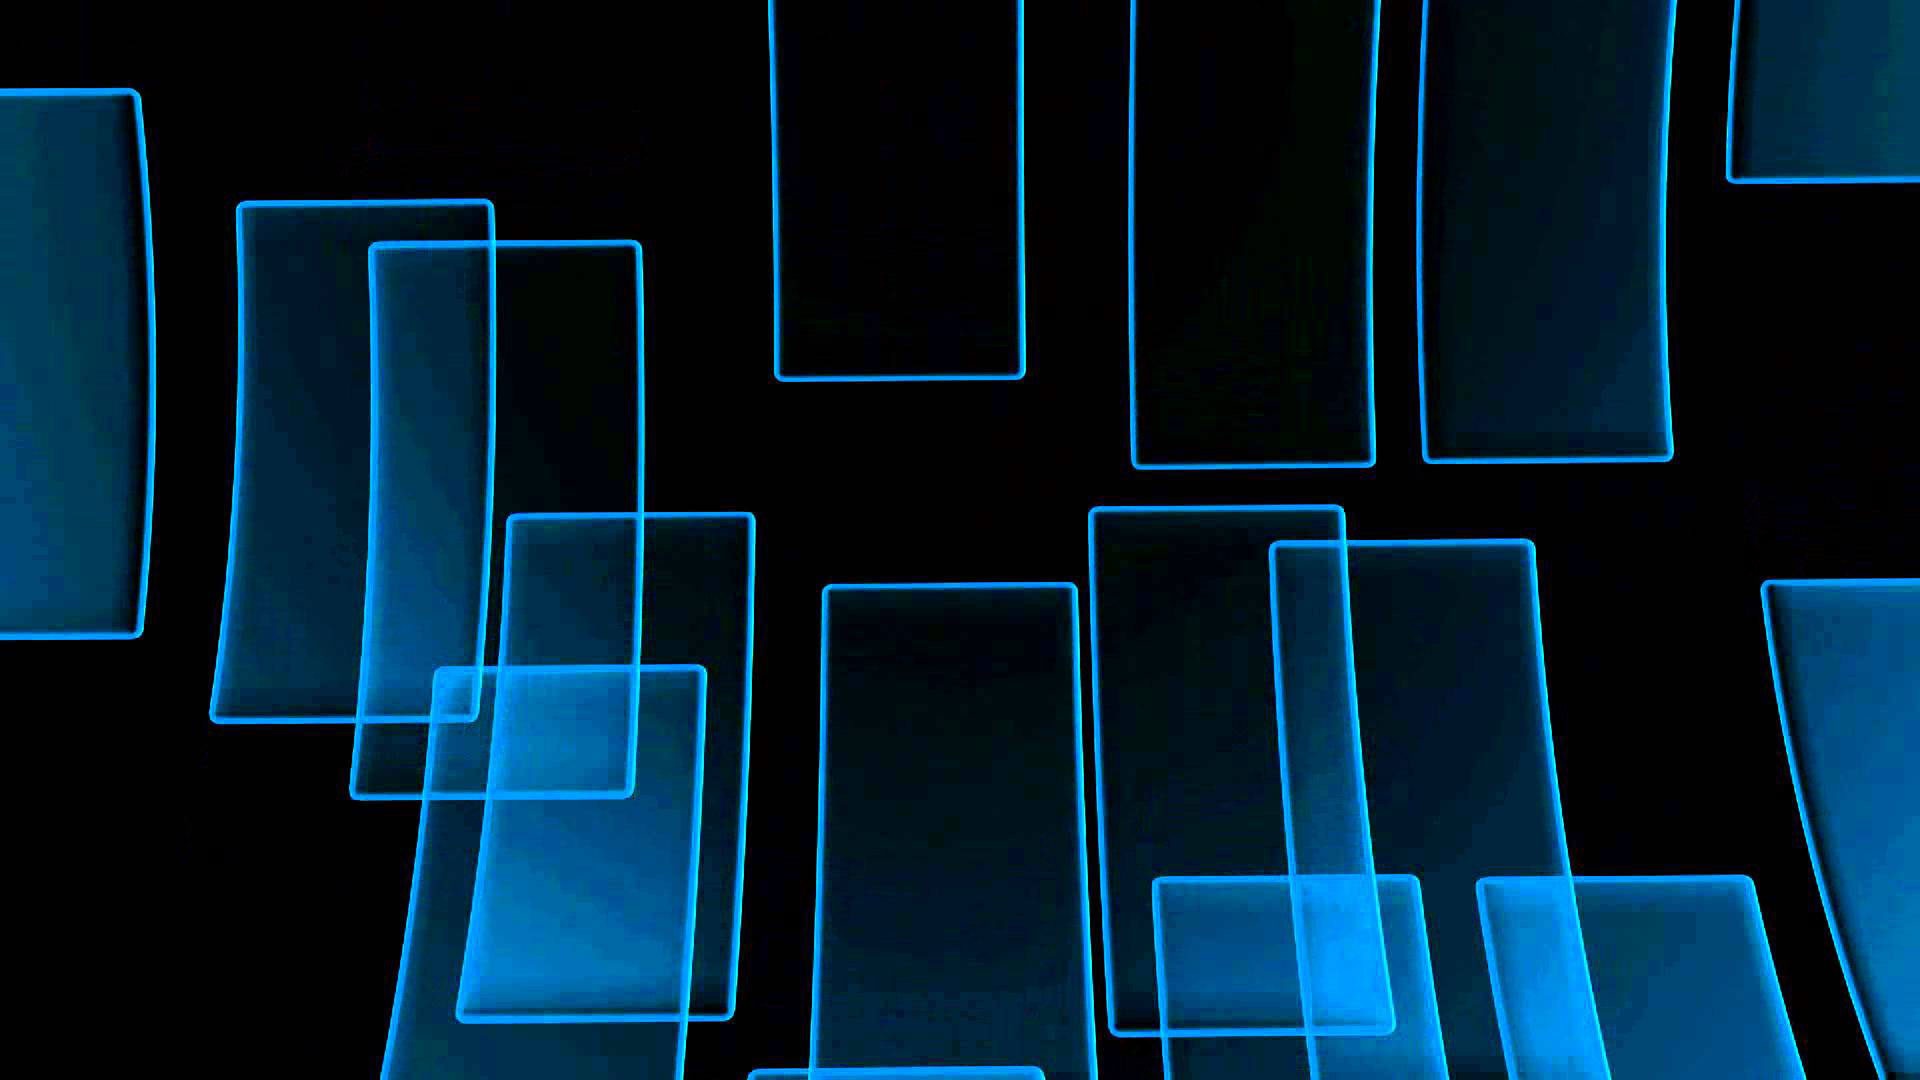 hd pics photos technology neon blue hd attractive desktop background  wallpaper